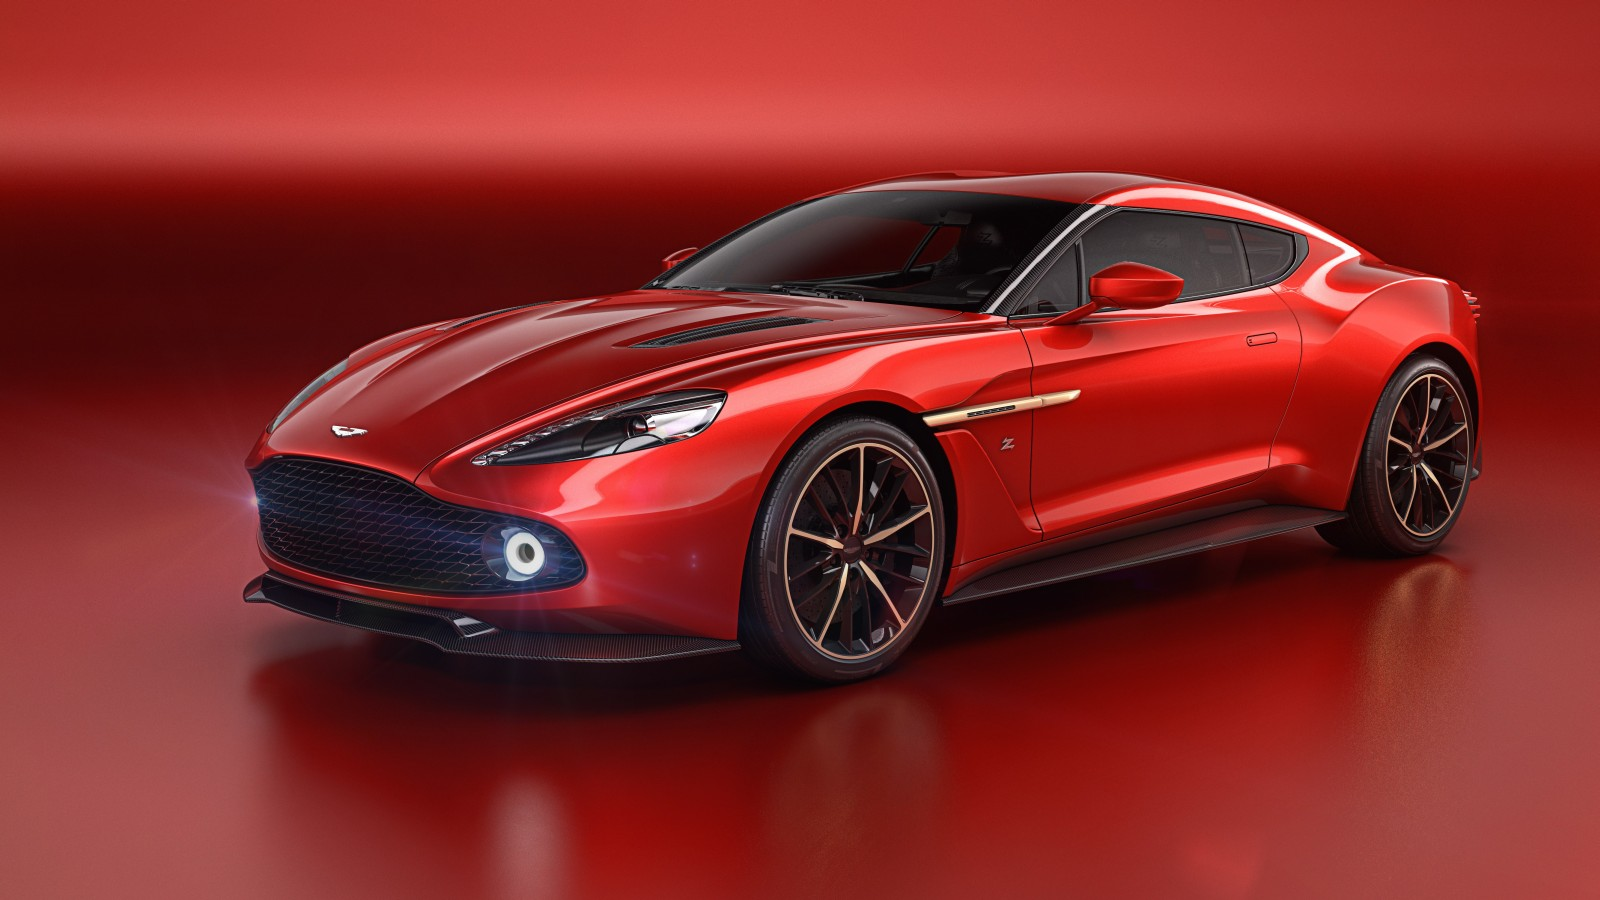 Aston Martin Vanquish Zagato concept (1)